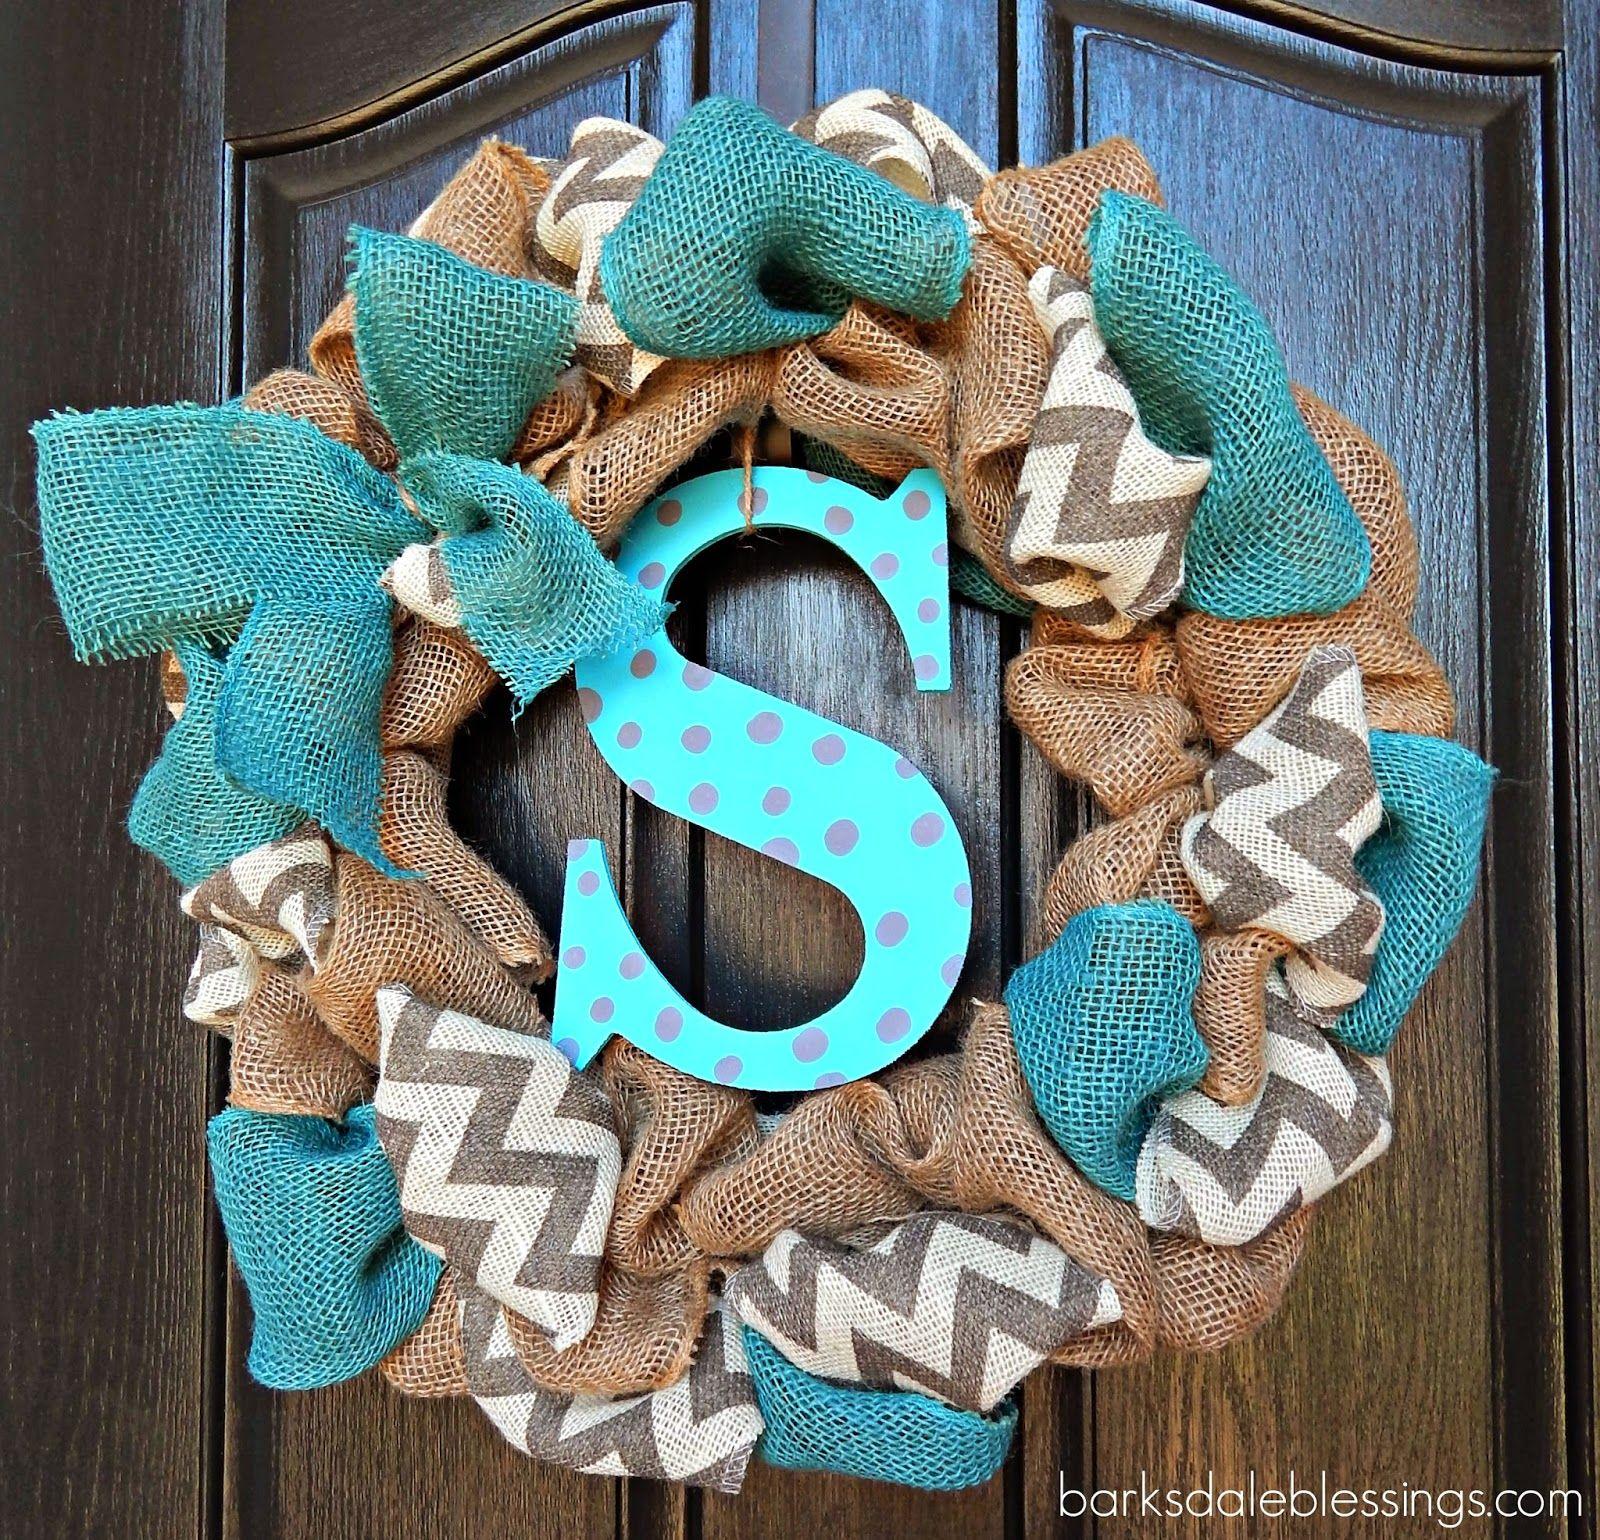 Barksdale Blessings DIY Burlap Ribbon Wreath Burlap